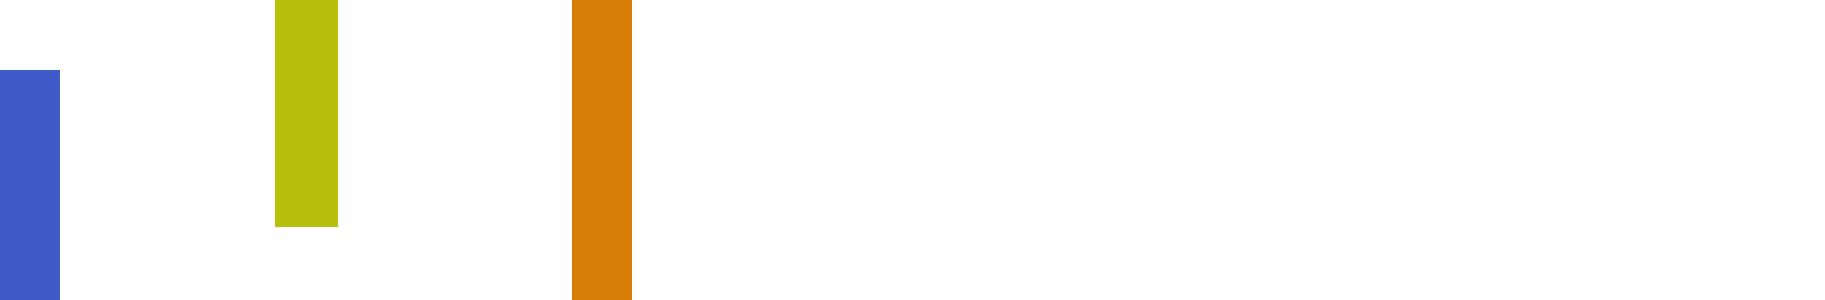 learnbuildingscience